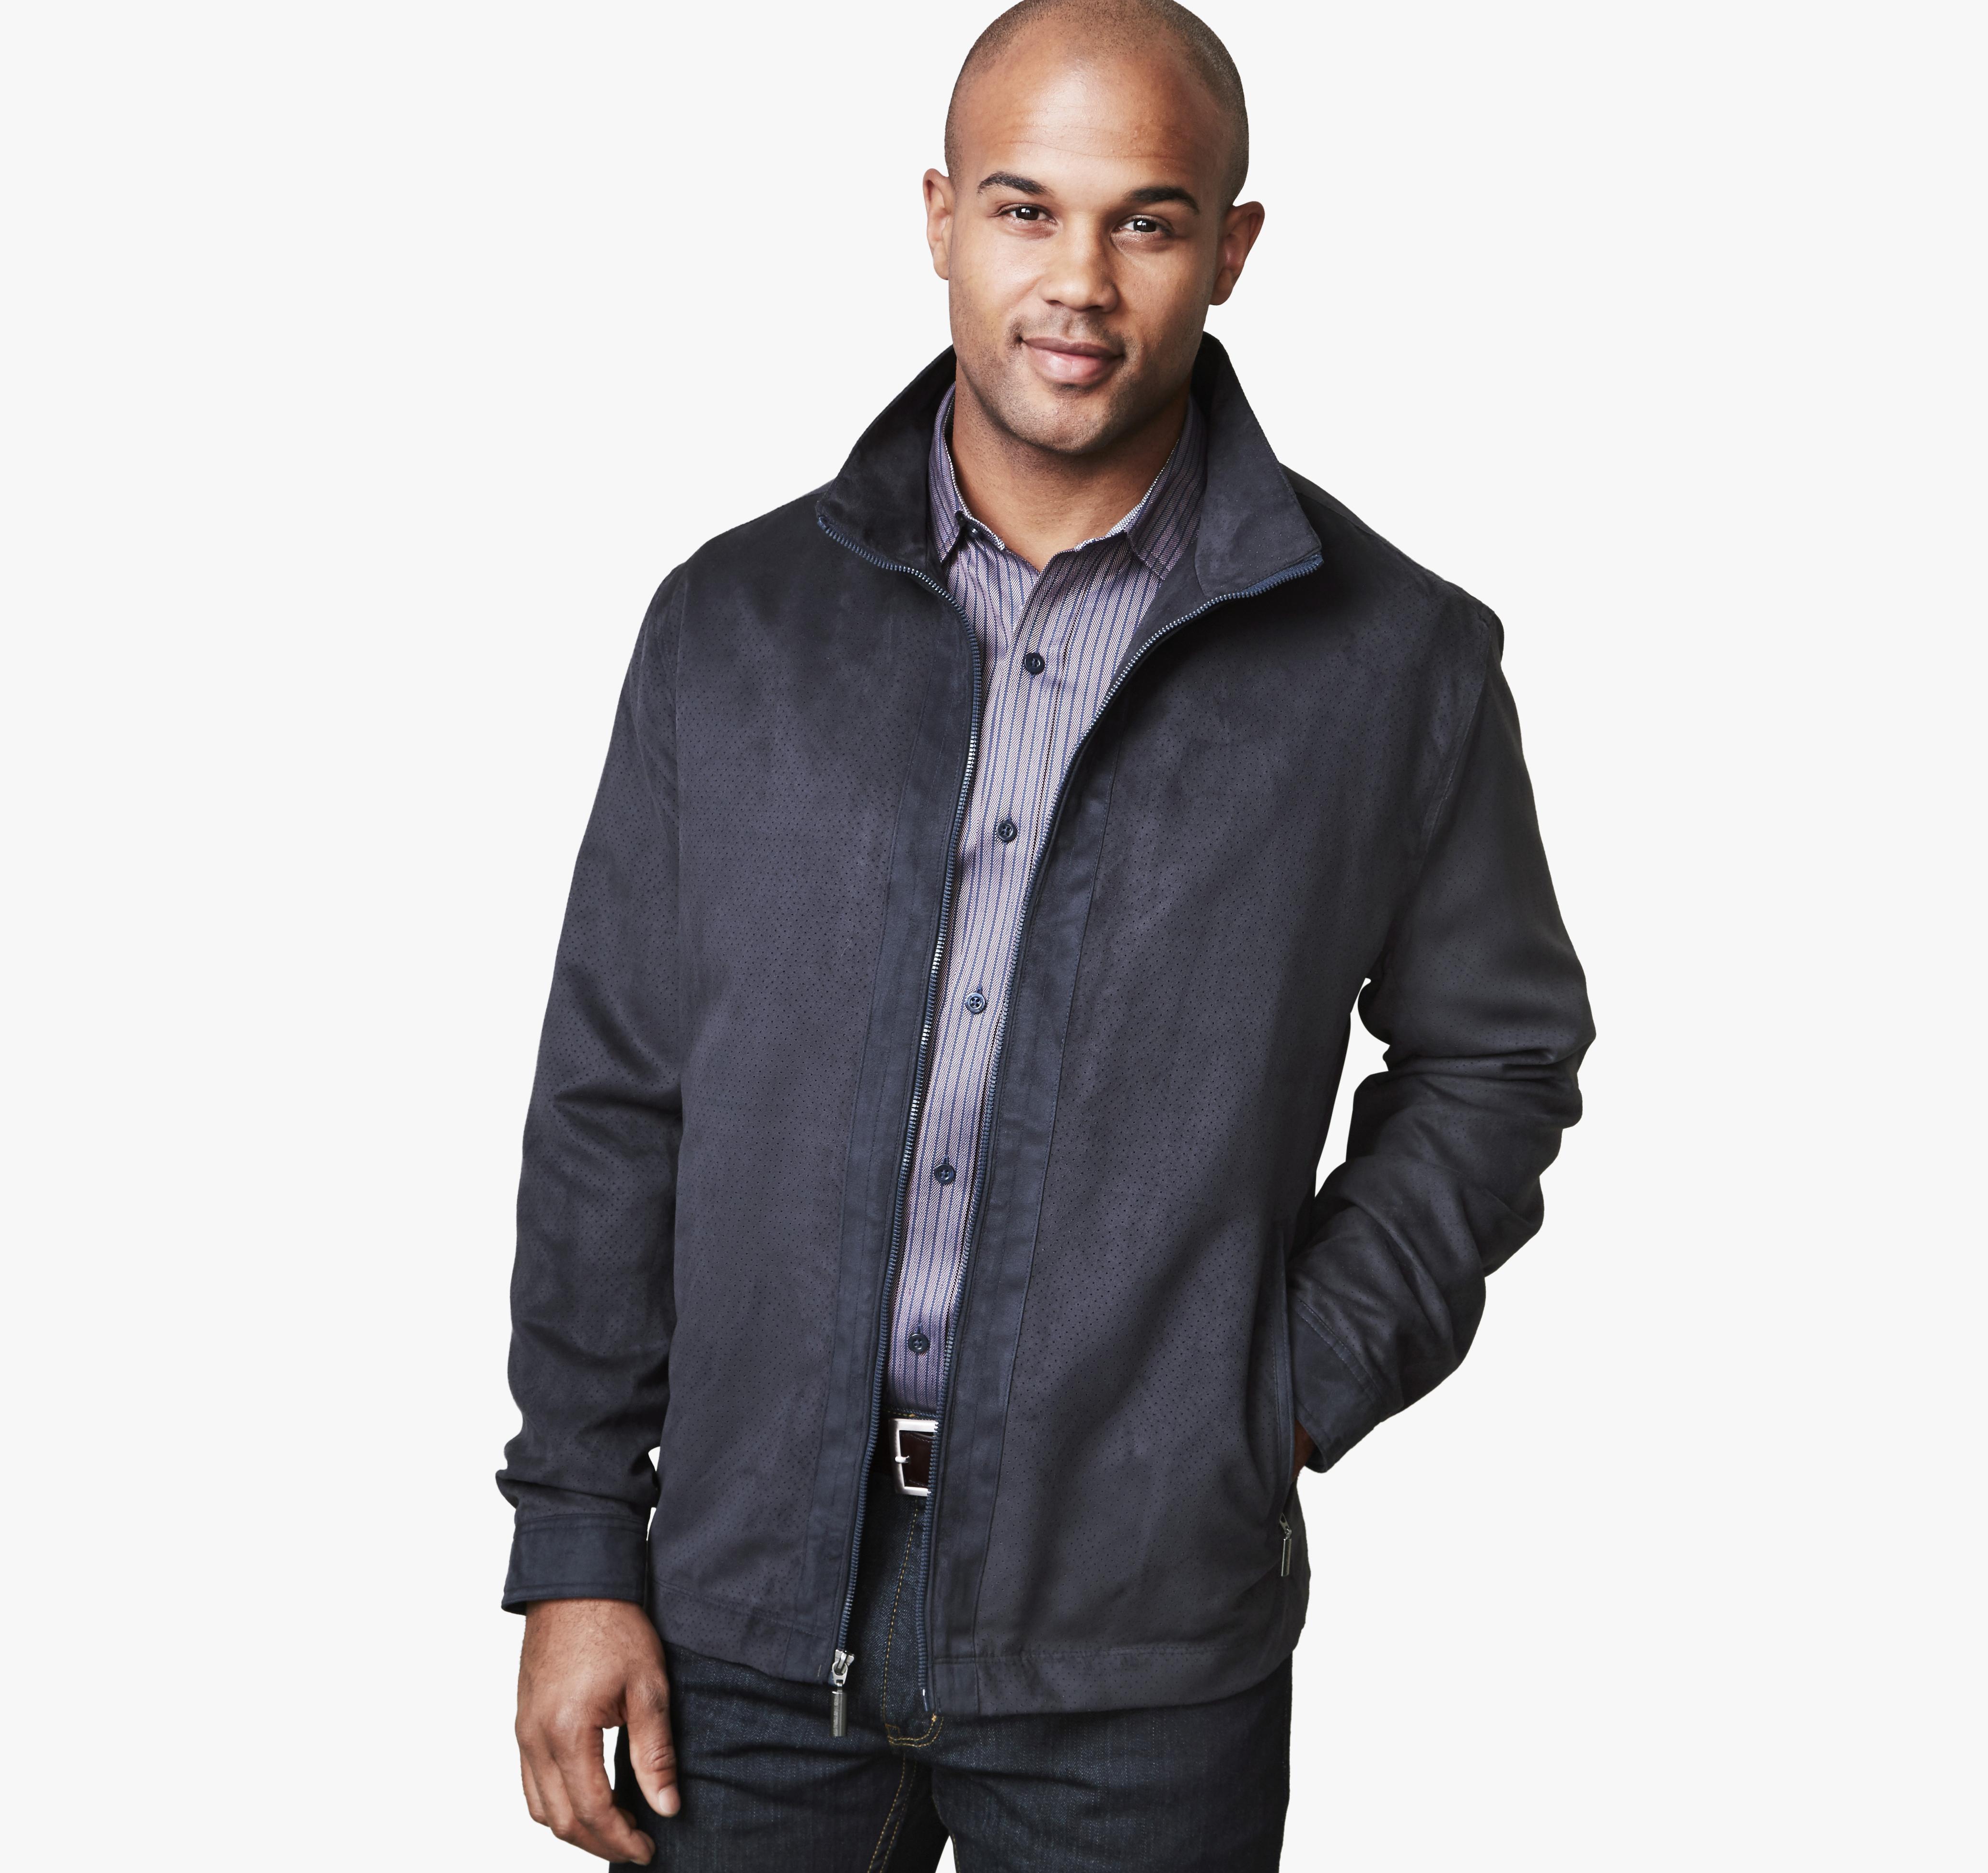 Johnston & Murphy Micro Suede Perf Jacket (Navy) $64